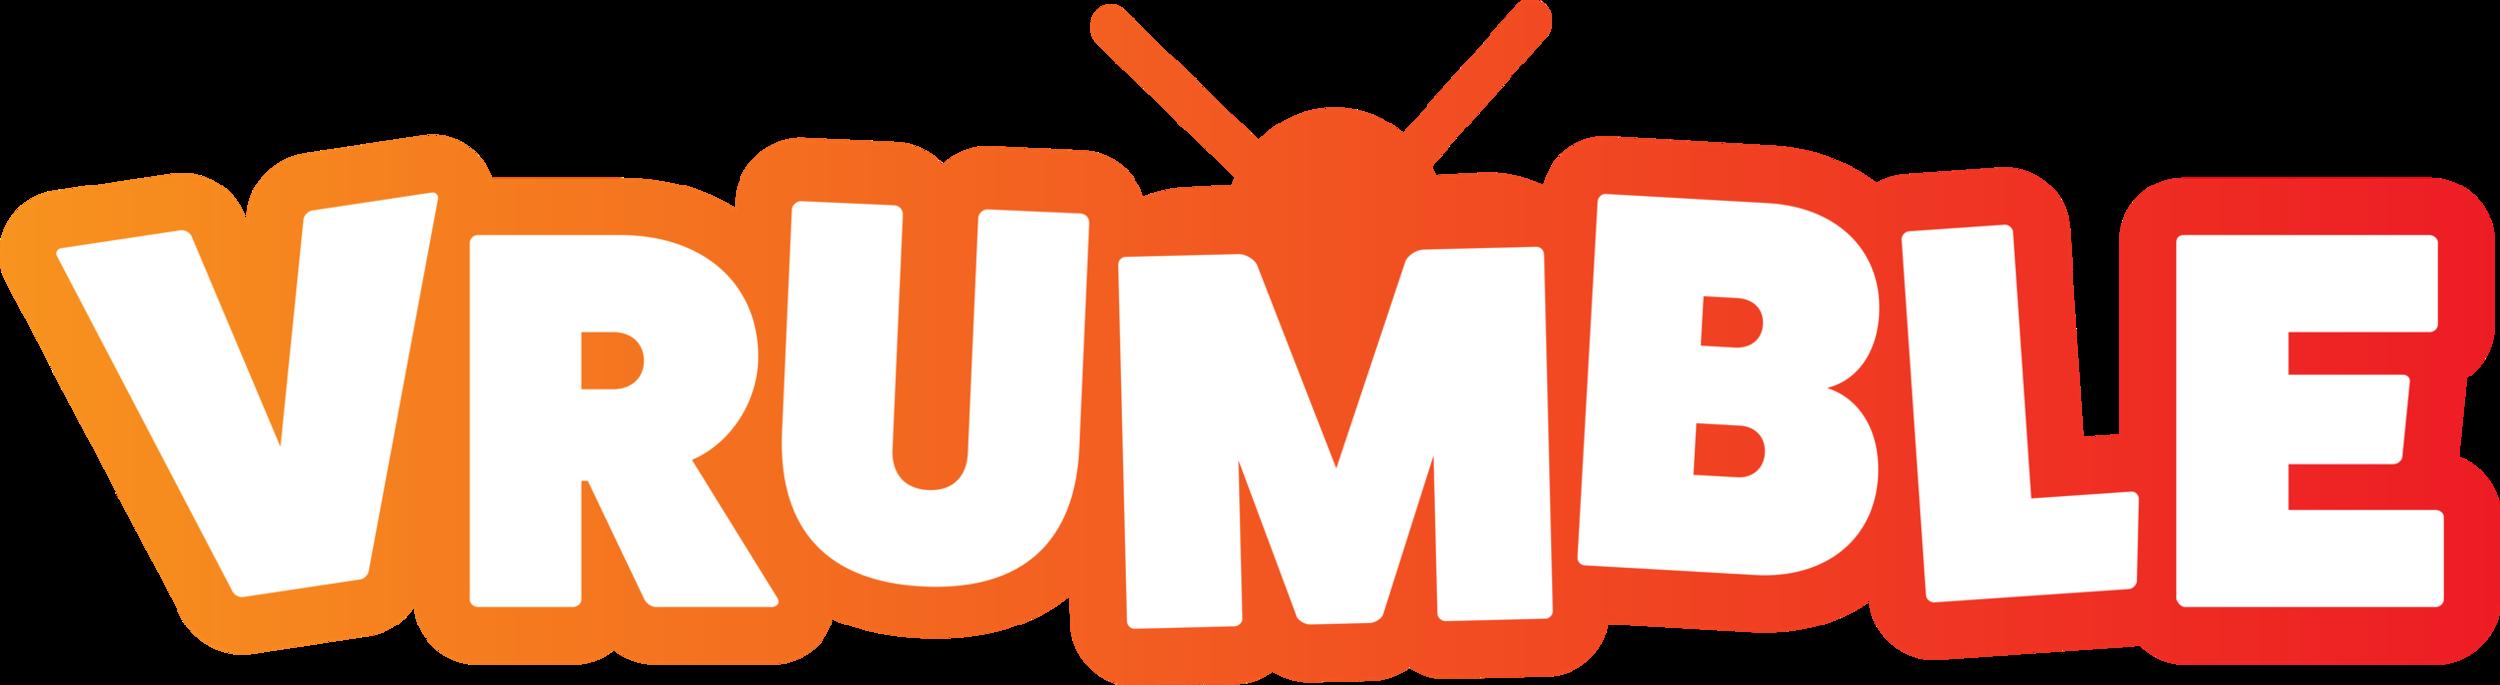 2540x696 pixels - Vrumble Logo .png